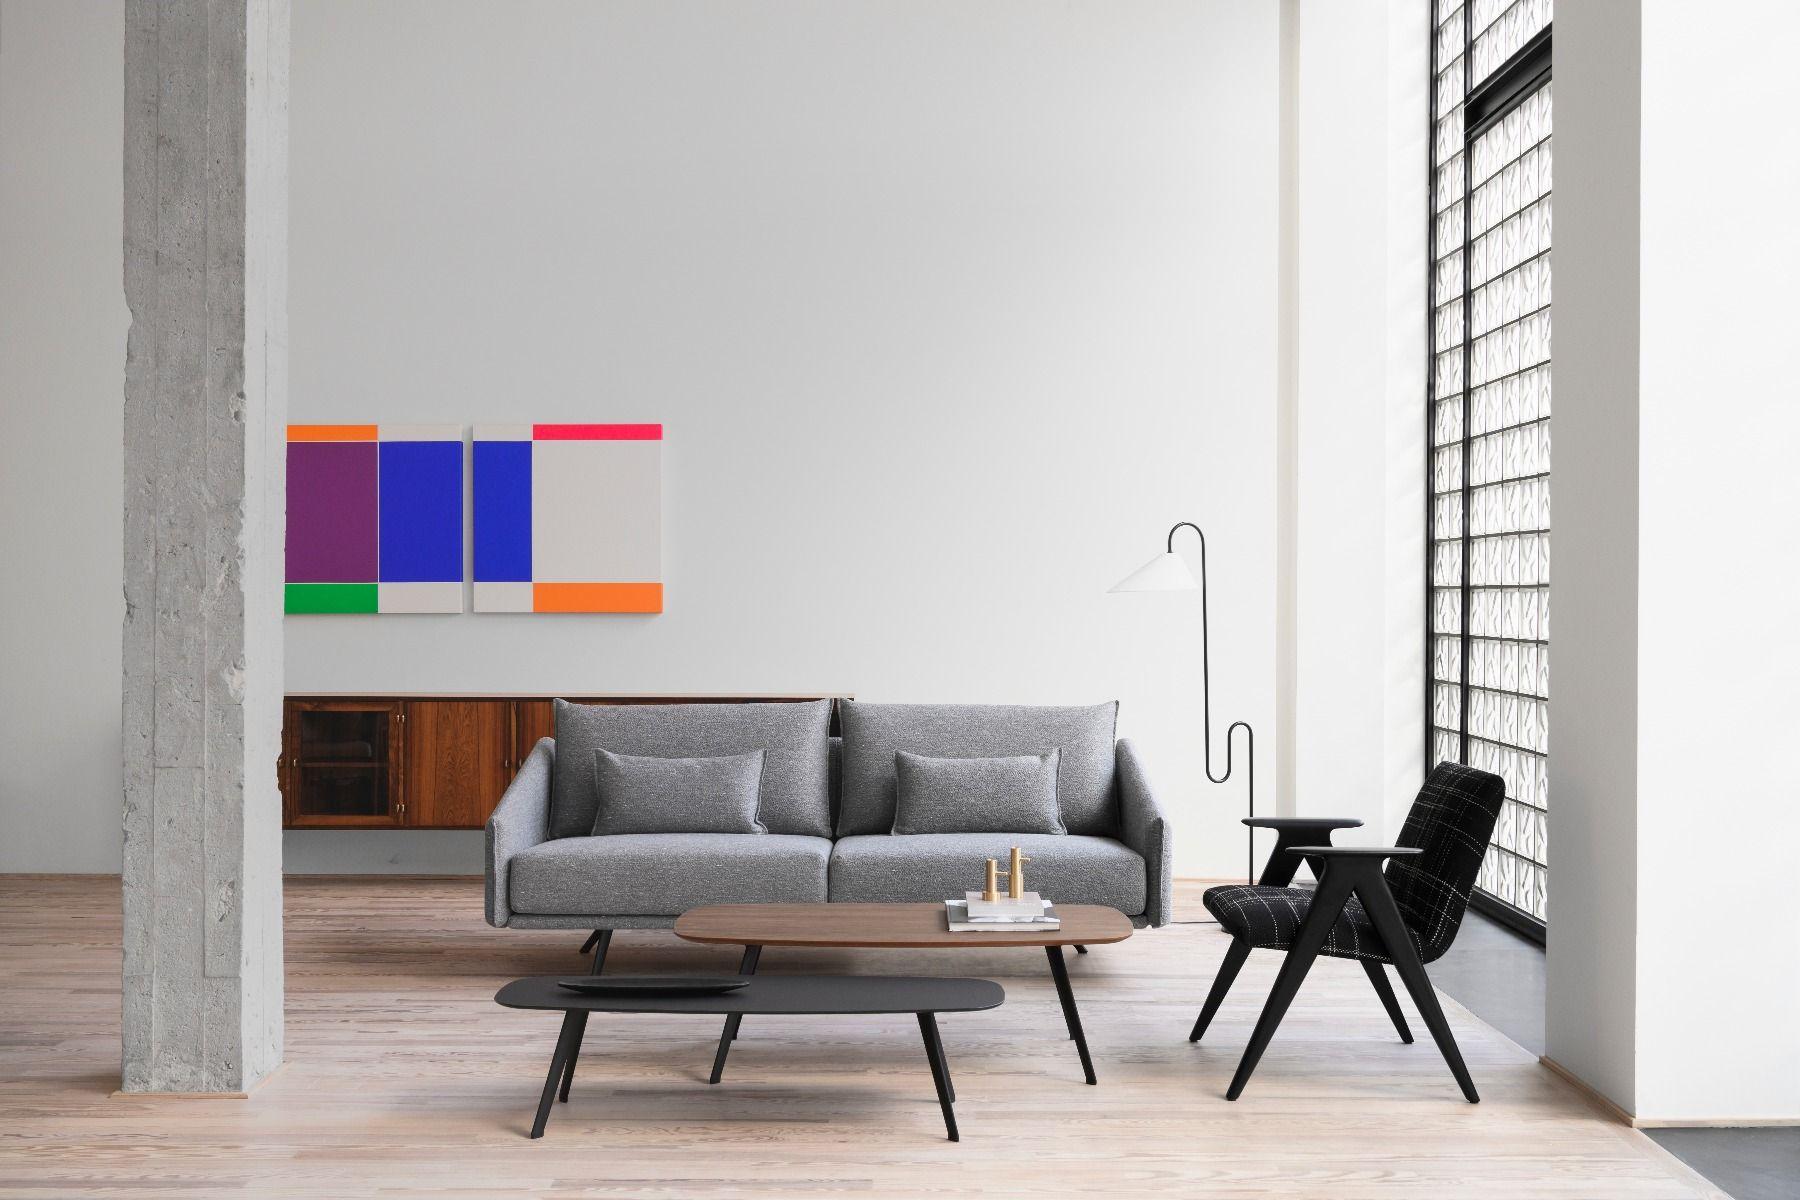 Stua Solapa Coffee Table-Fenix with costura sofa and libera chair